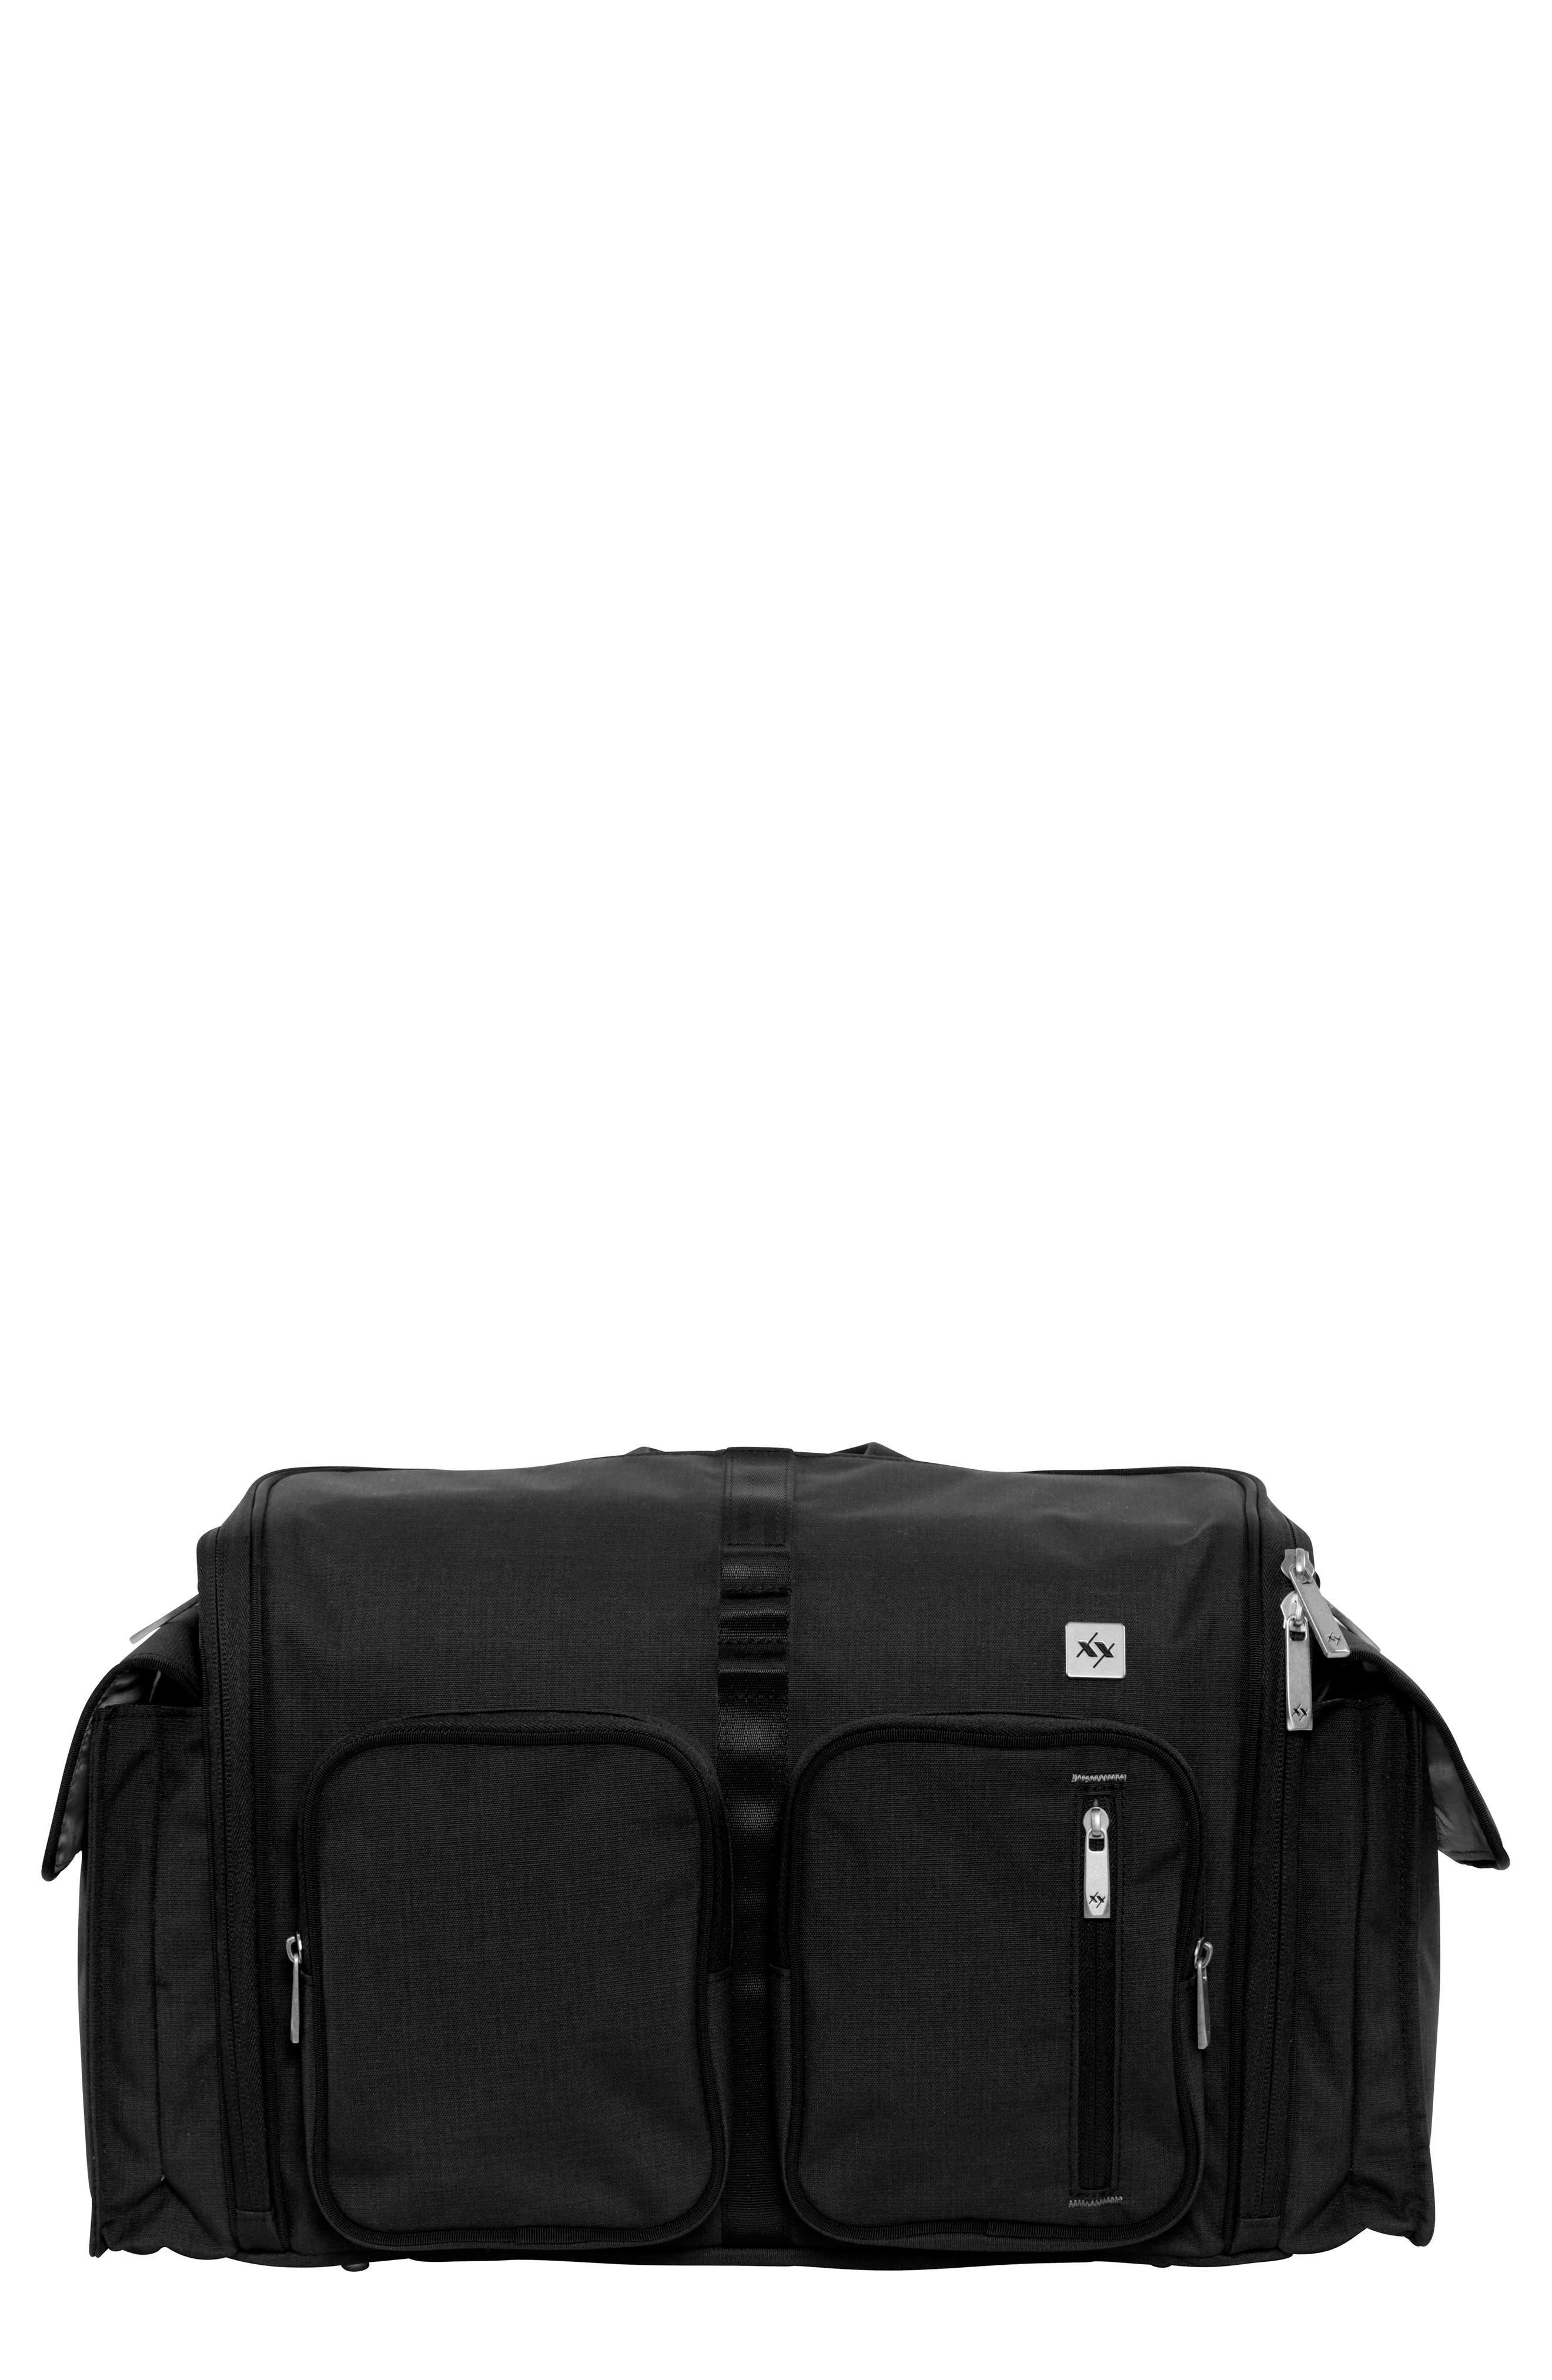 Main Image - Ju-Ju-Be XY Clone Diaper Bag